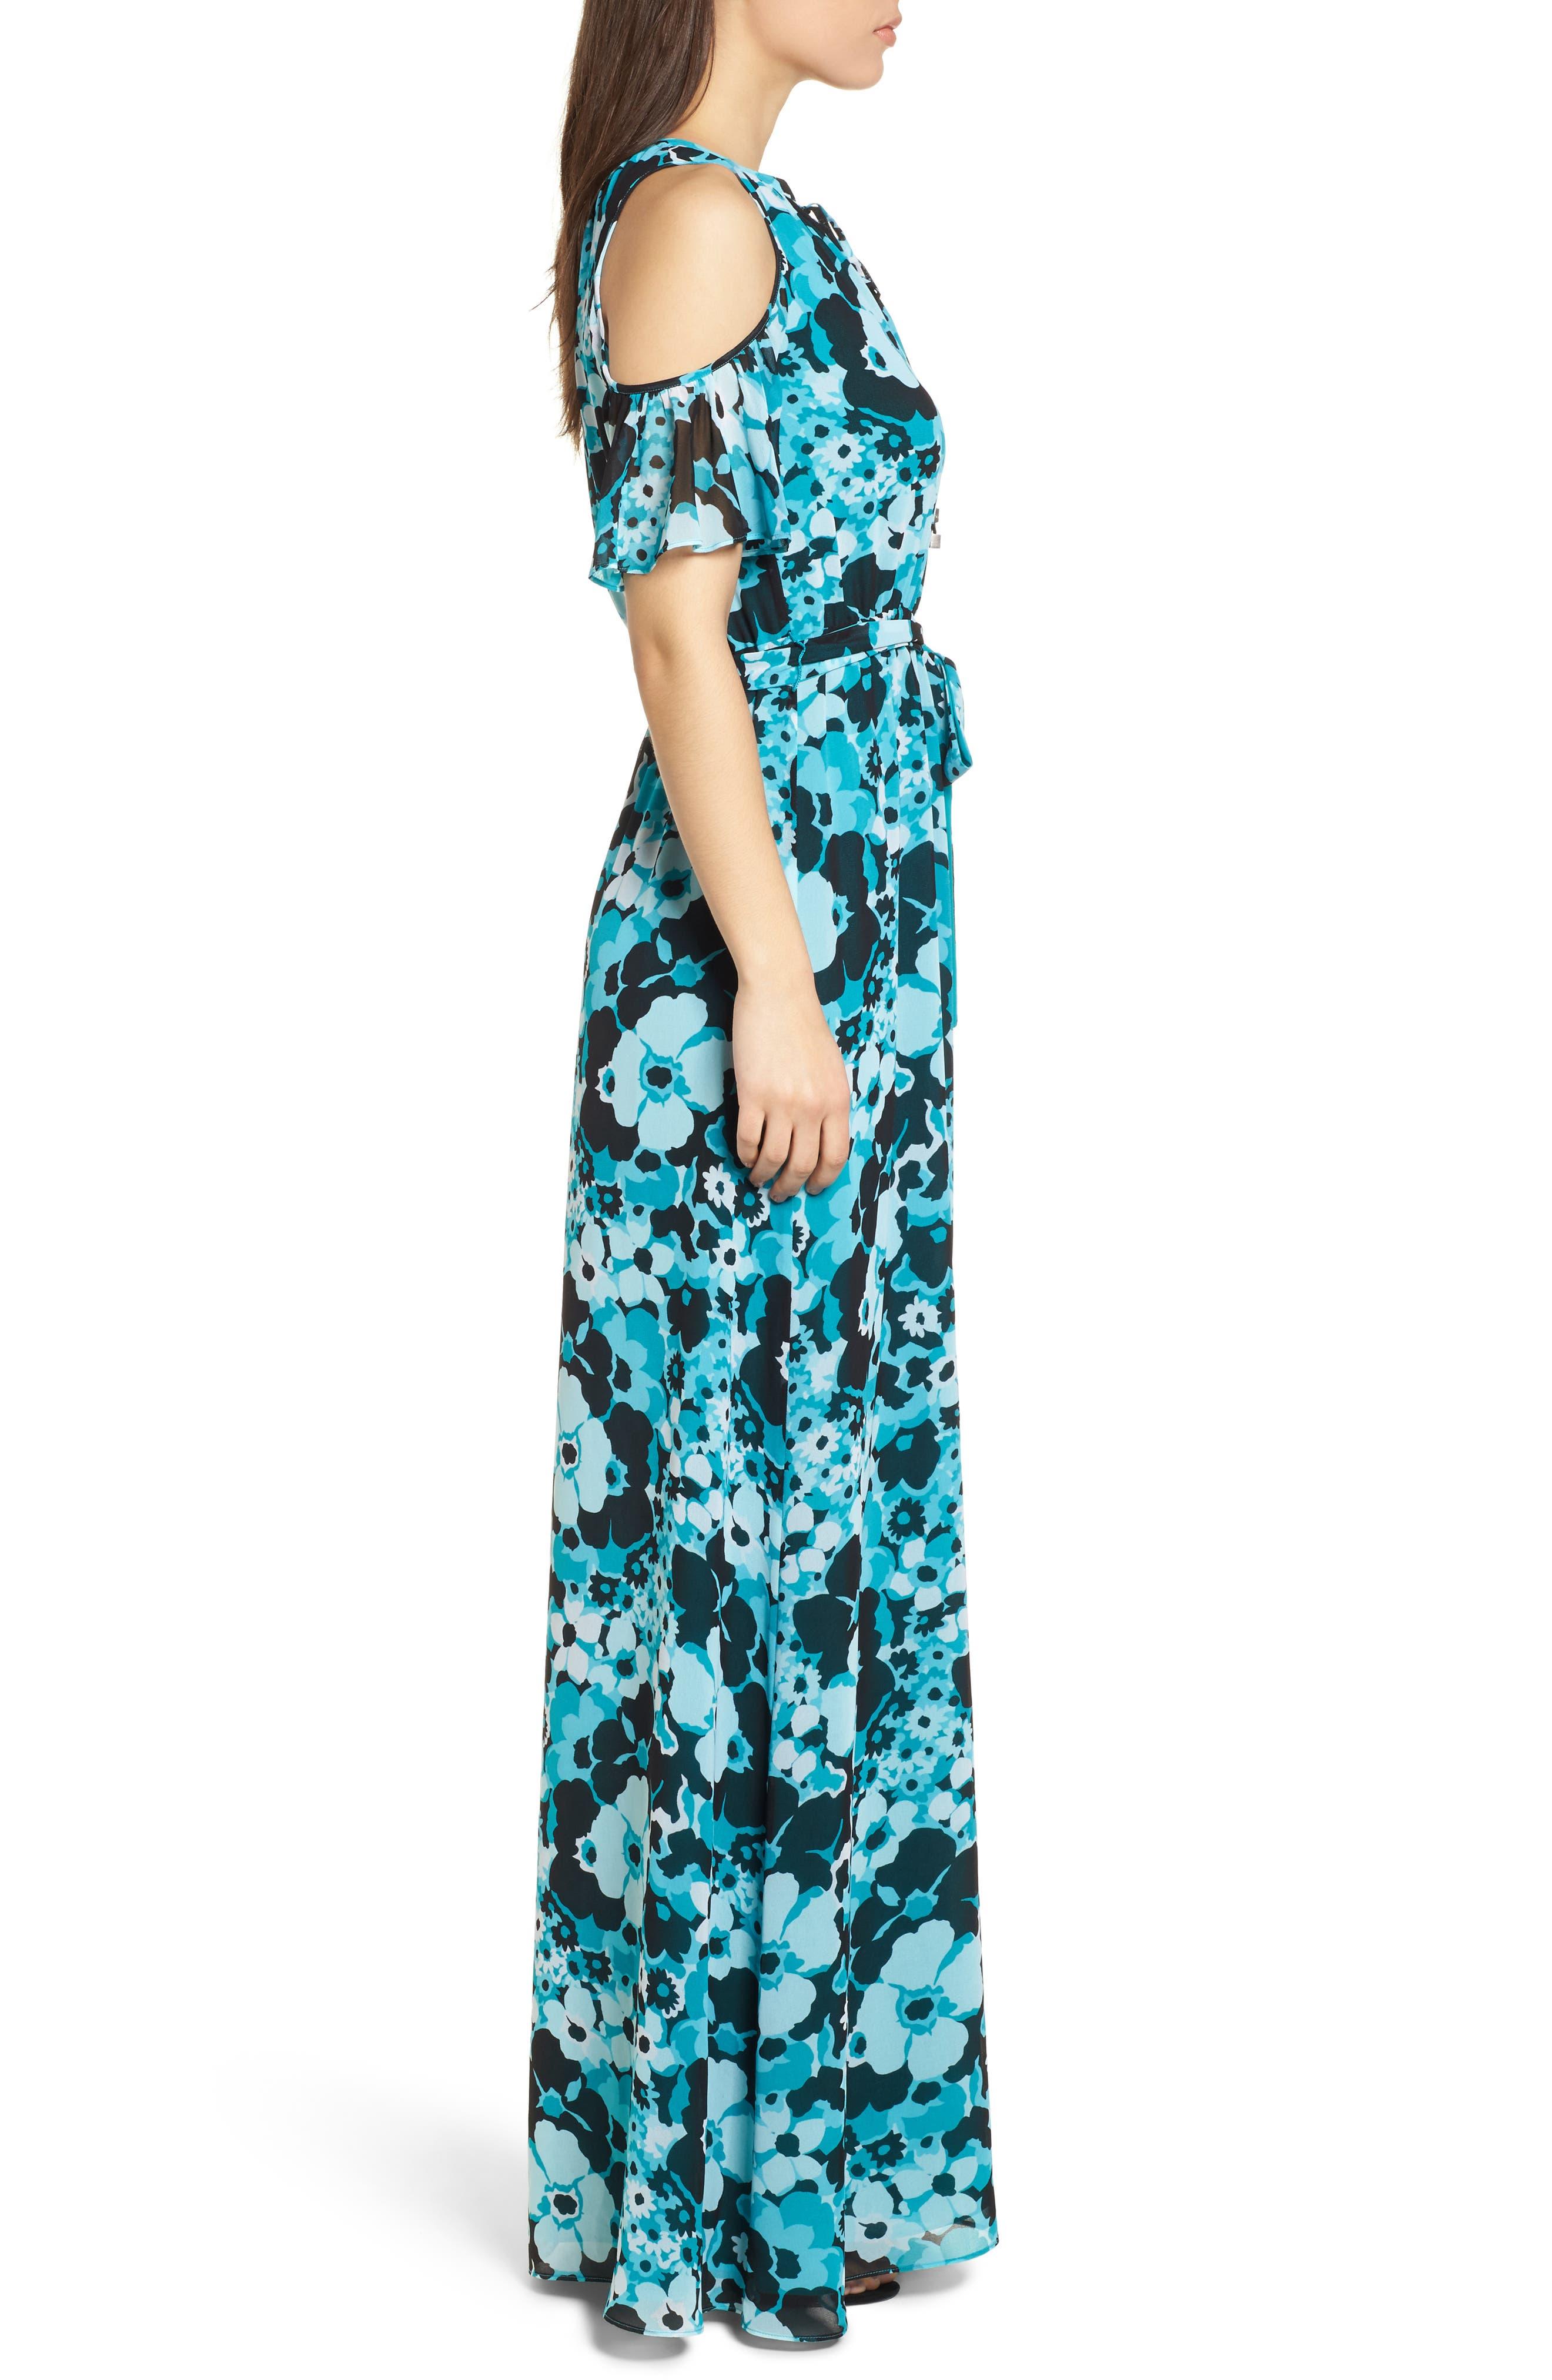 Spring Floral Maxi Dress,                             Alternate thumbnail 3, color,                             Tile Blue/ Black Multi